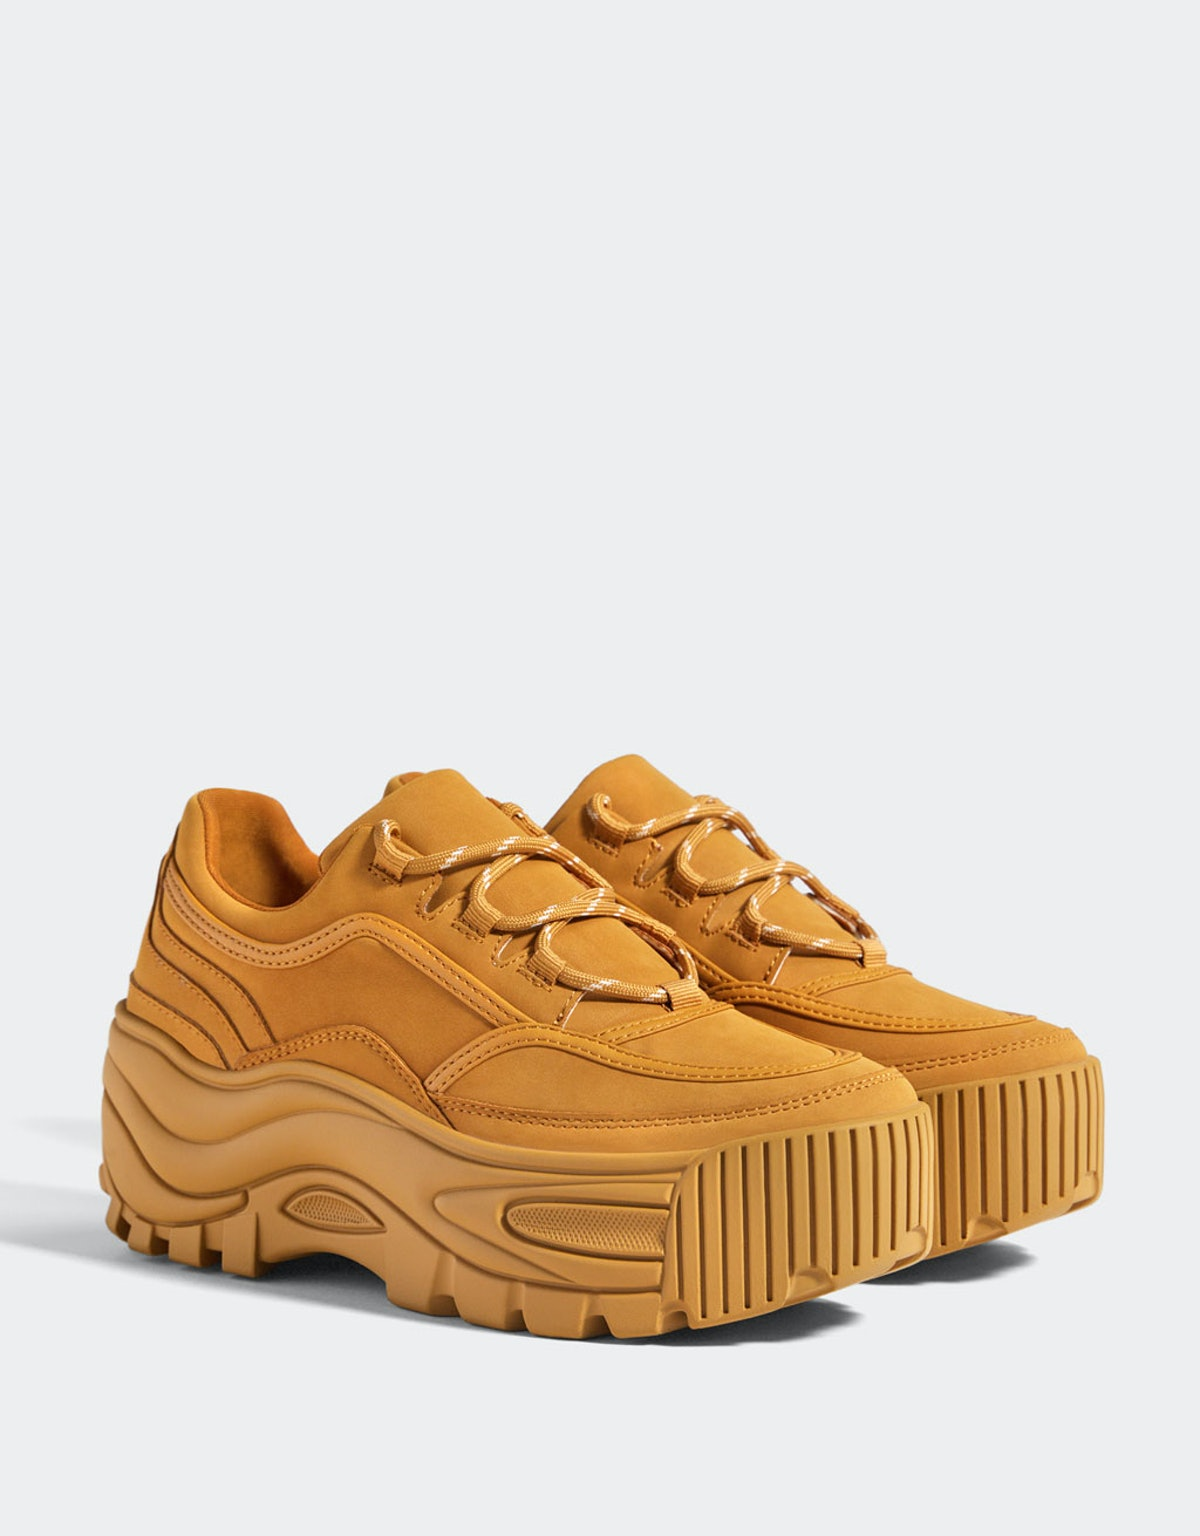 Monochrome platform sneakers